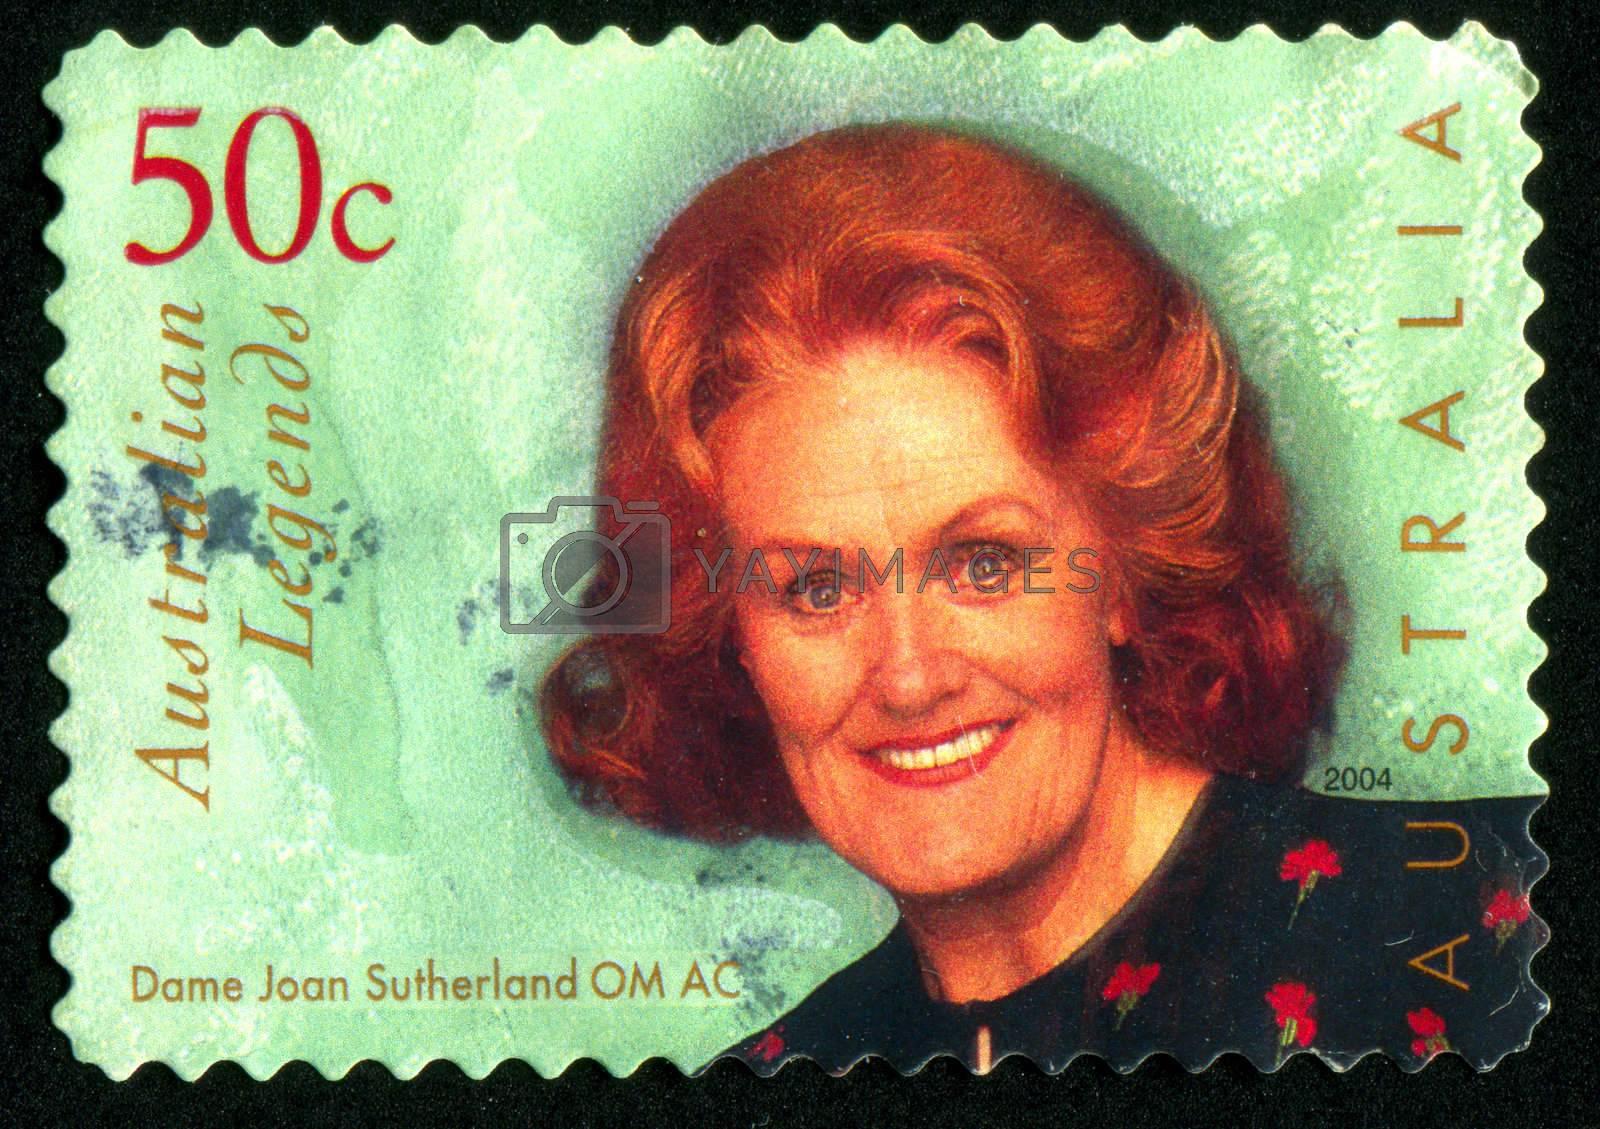 AUSTRALIA - CIRCA 2004: stamp printed by Australia, shows Dame Joan Sutherland, opera singer, circa 2004